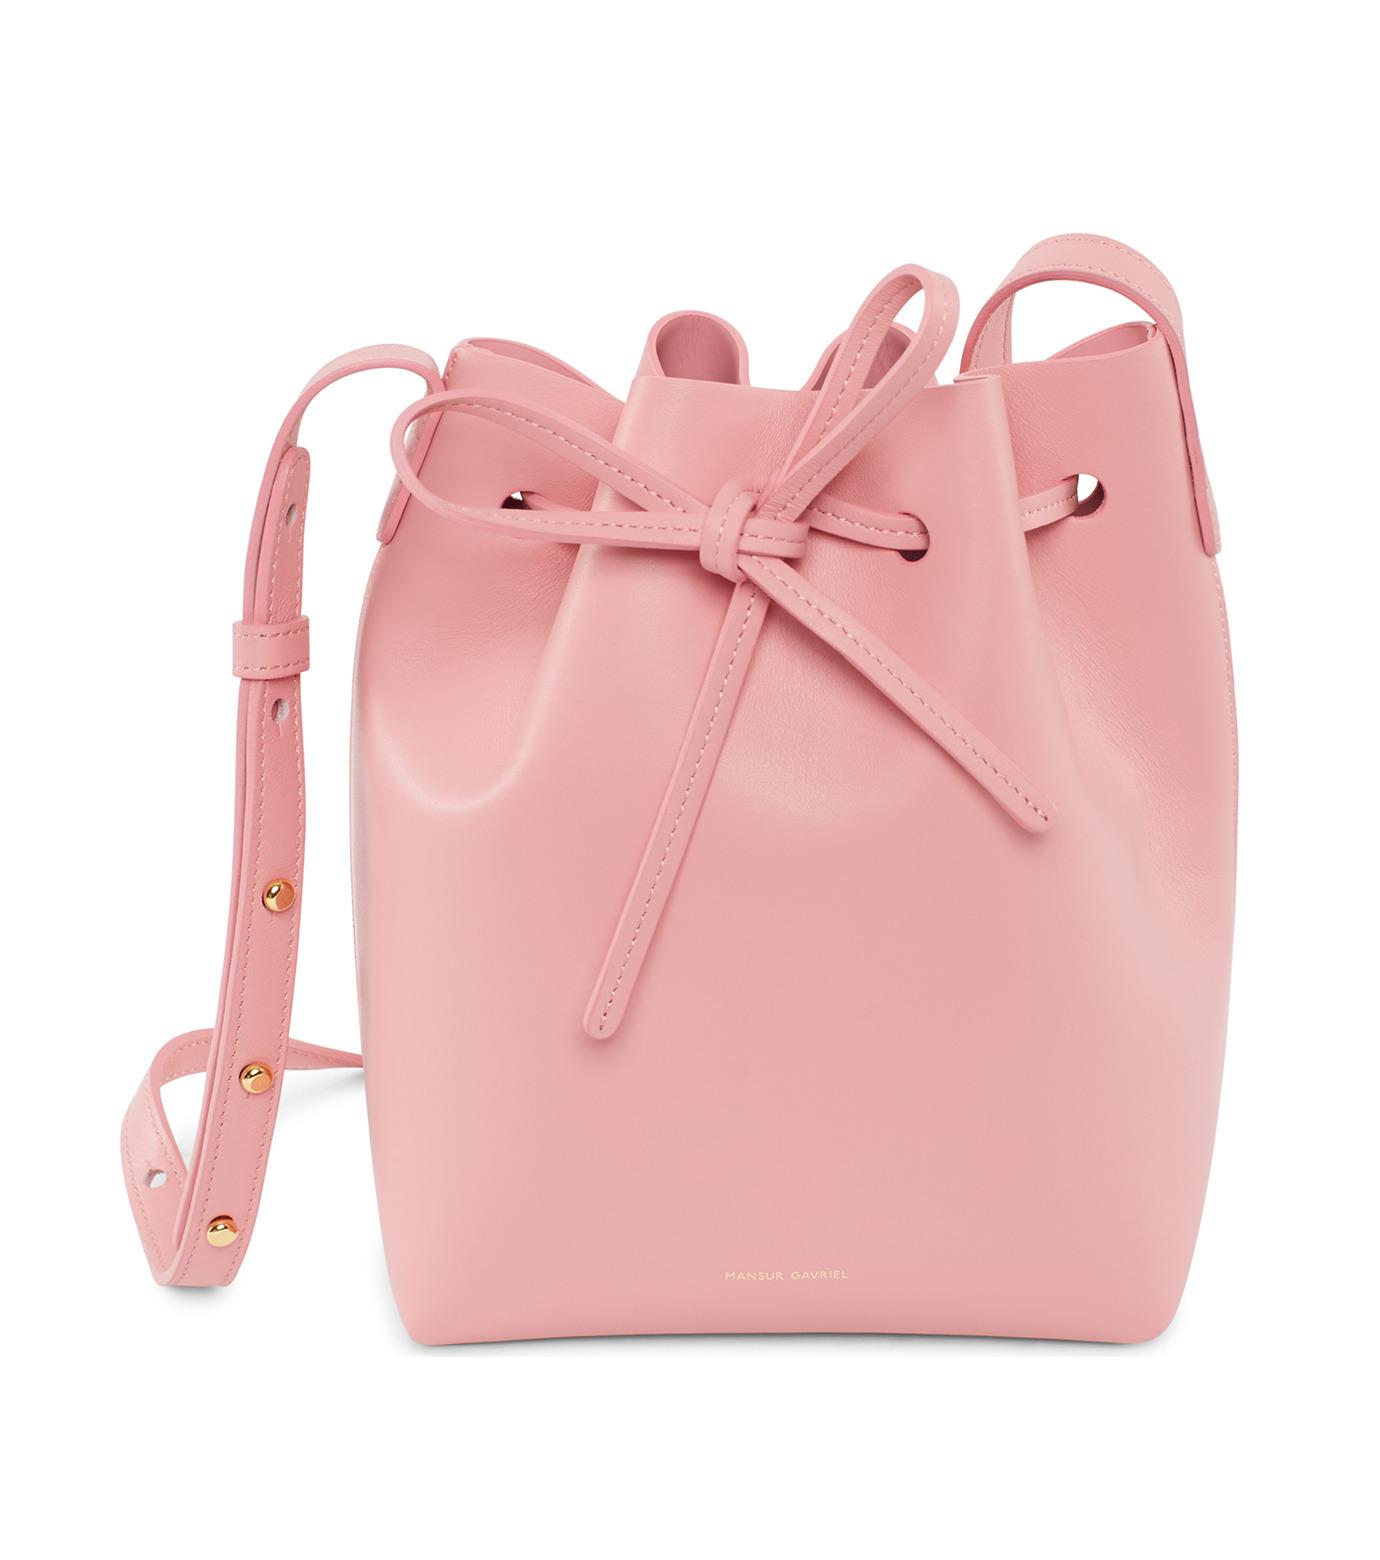 Mansur Gavriel(マンサーガブリエル)のMini Bucket Bag-PINK(バッグ/bag)-HMB004CA-72 拡大詳細画像1